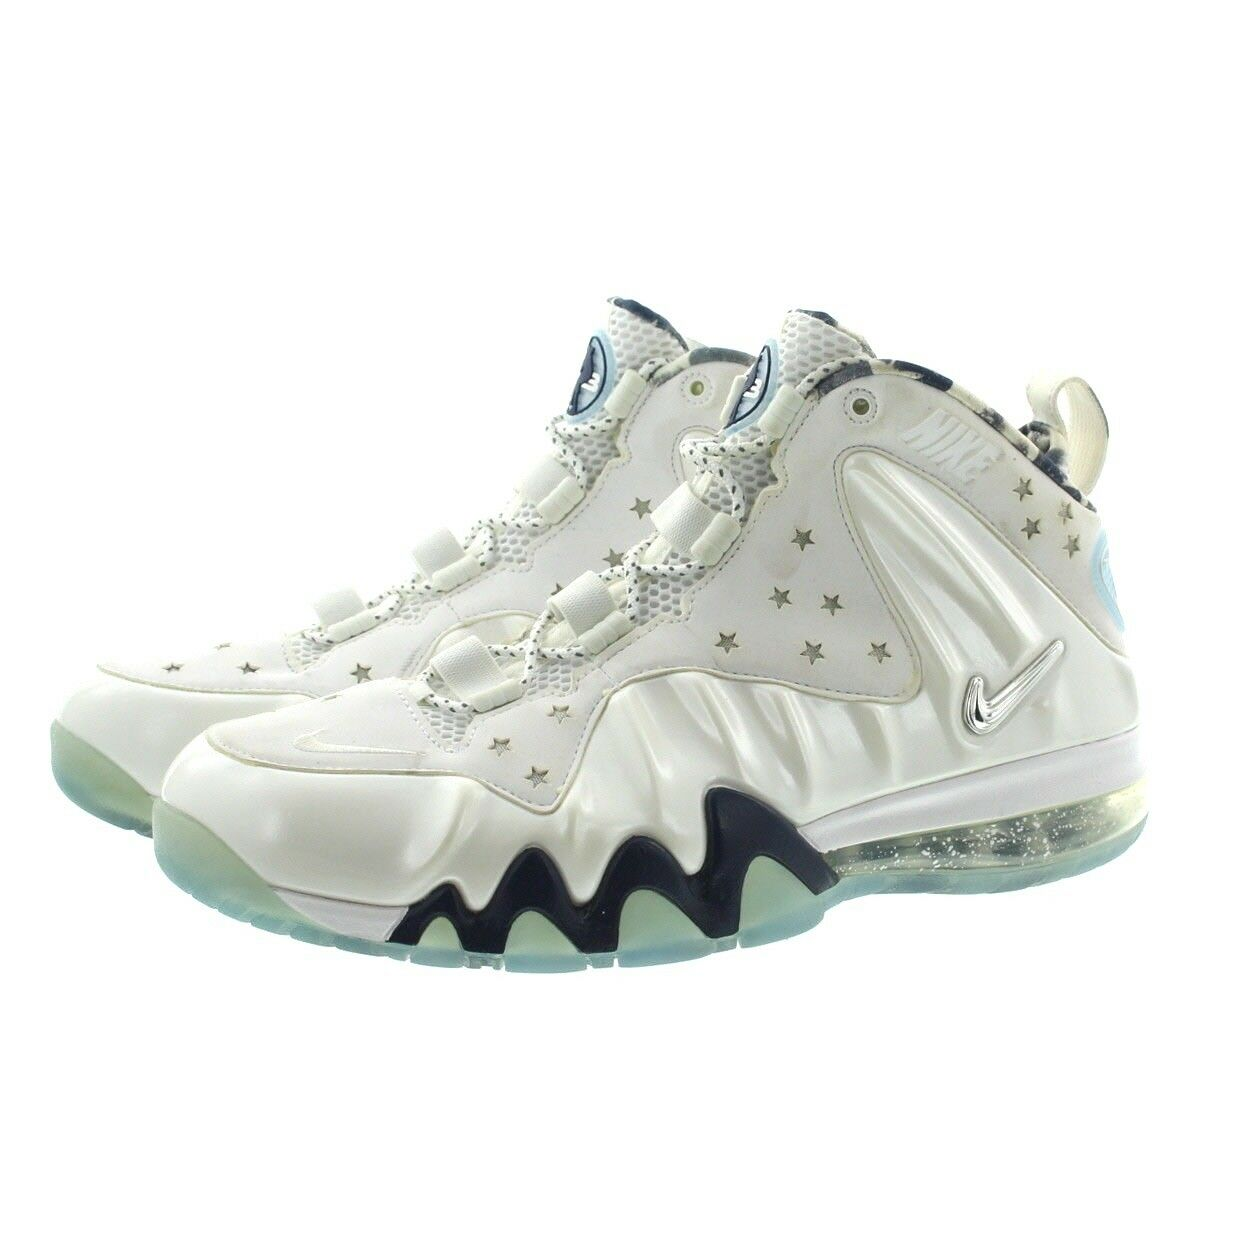 Nike mitte air max 588527 mens barkley posite mitte Nike der top - basketball - schuhe, schuhe, 9,5 a03a4d